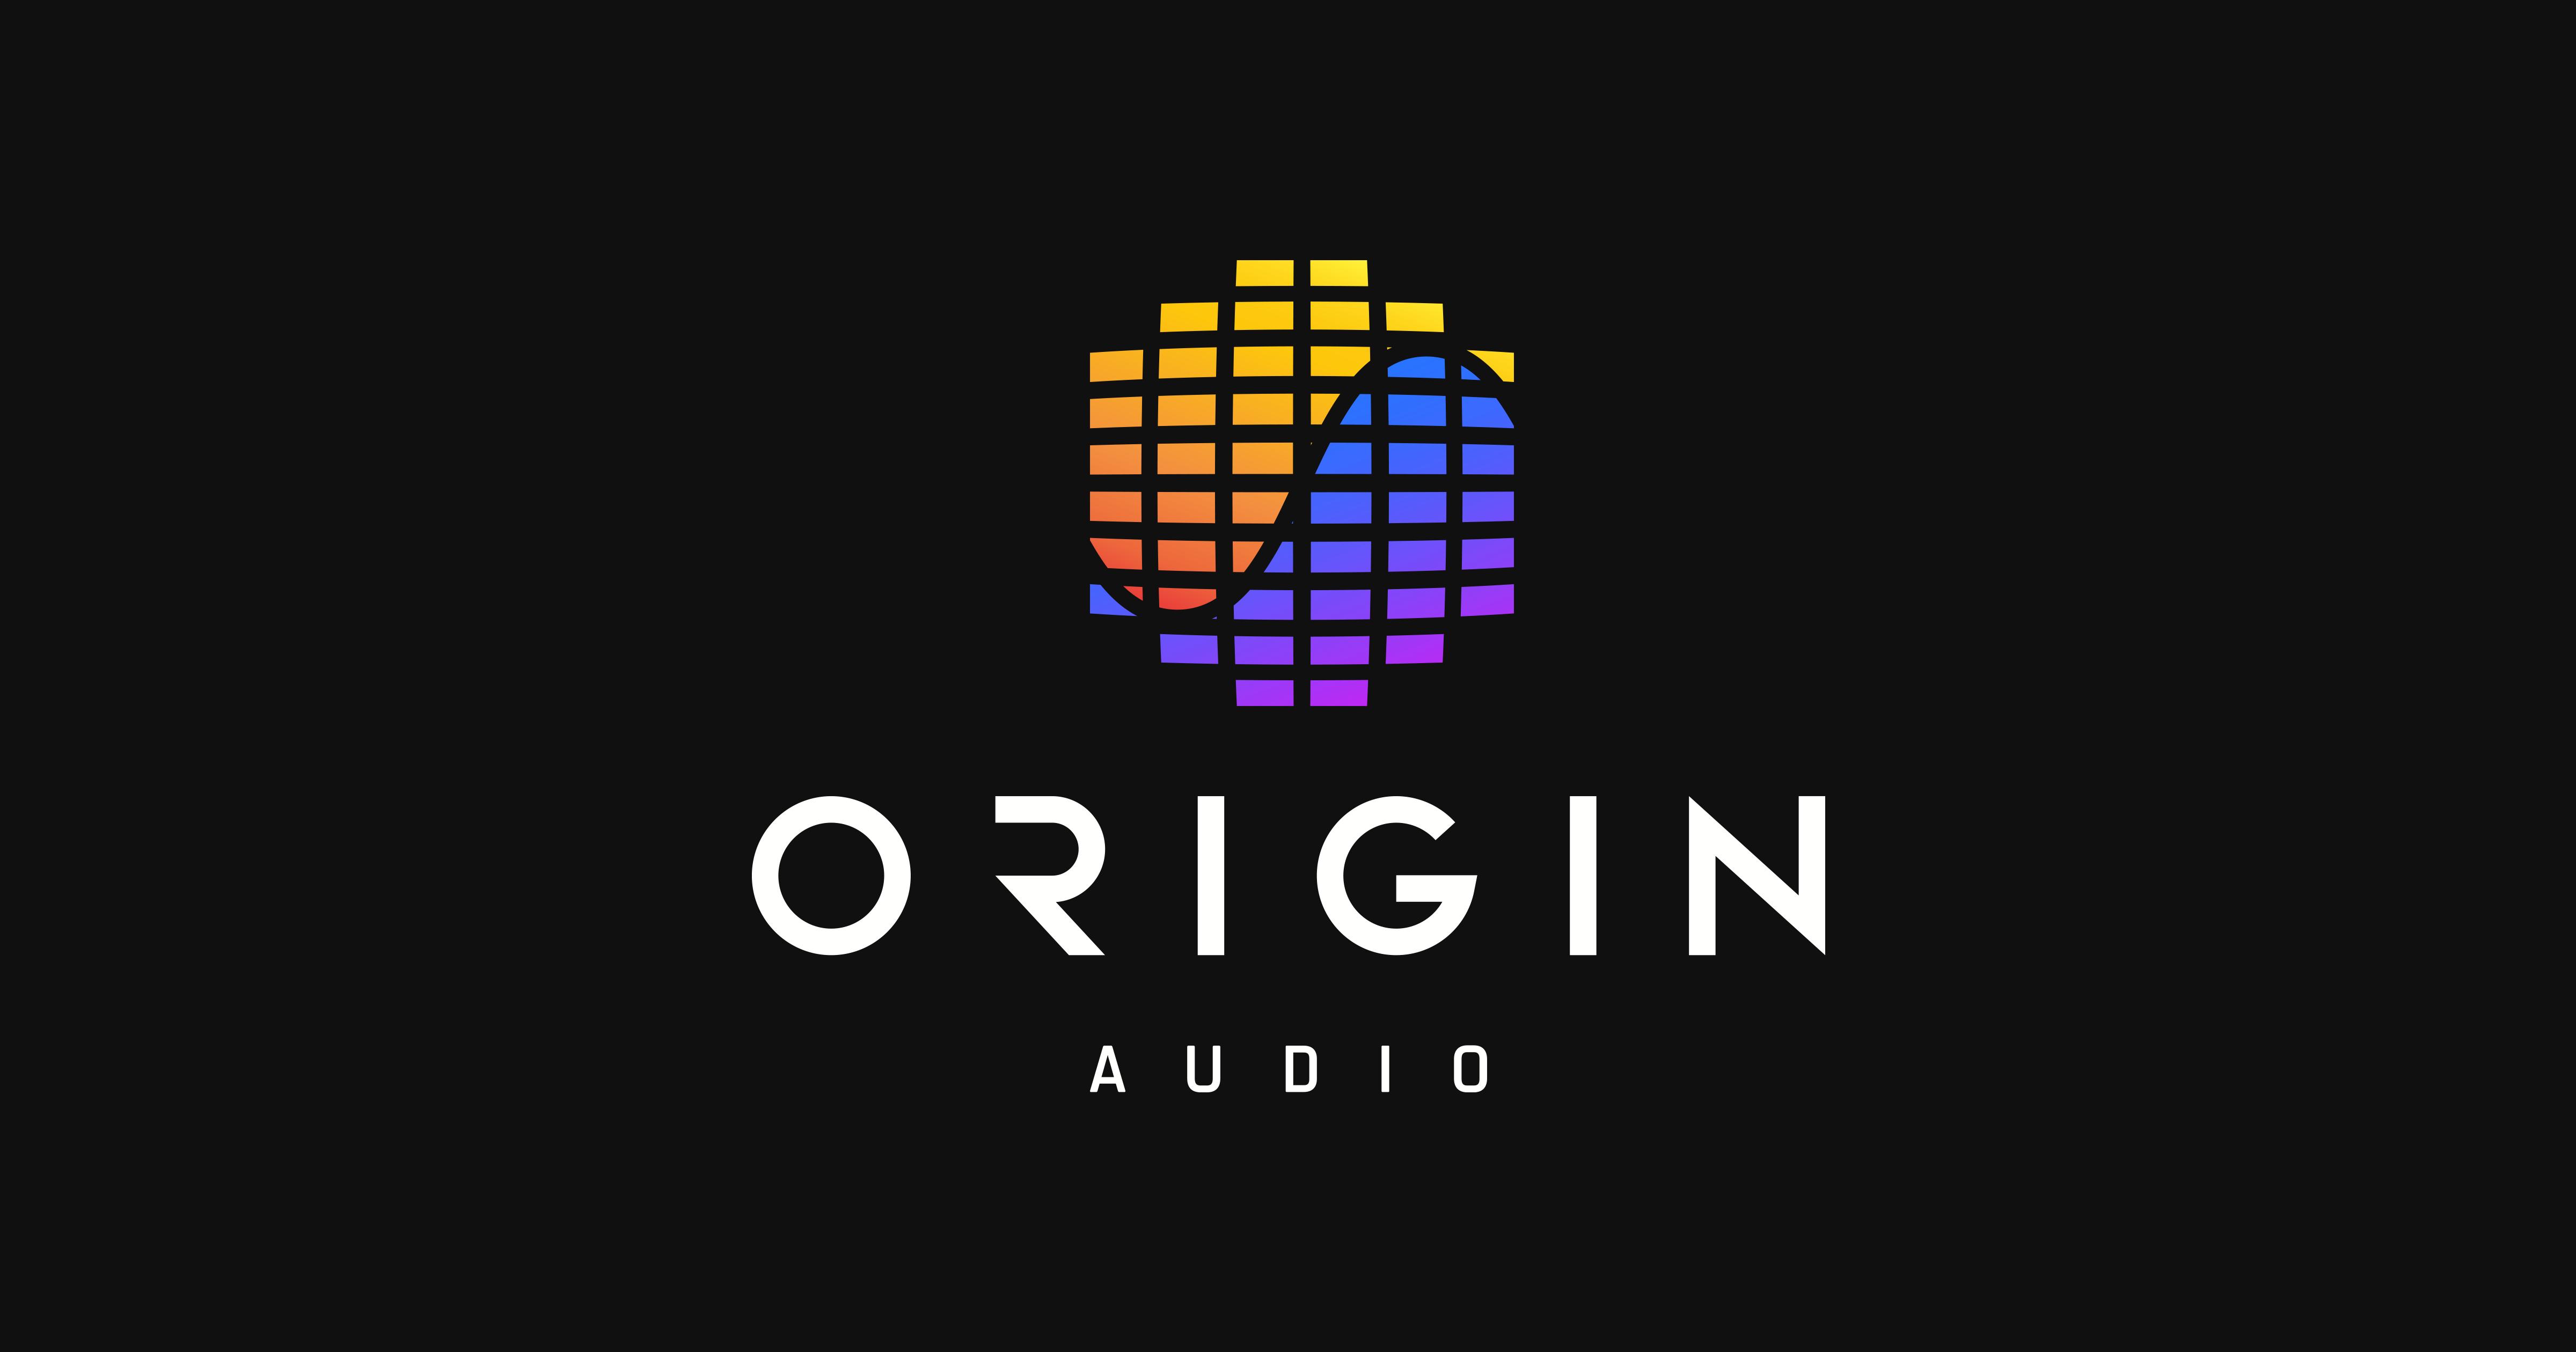 Origin Audio logo by Peacetime Propaganda